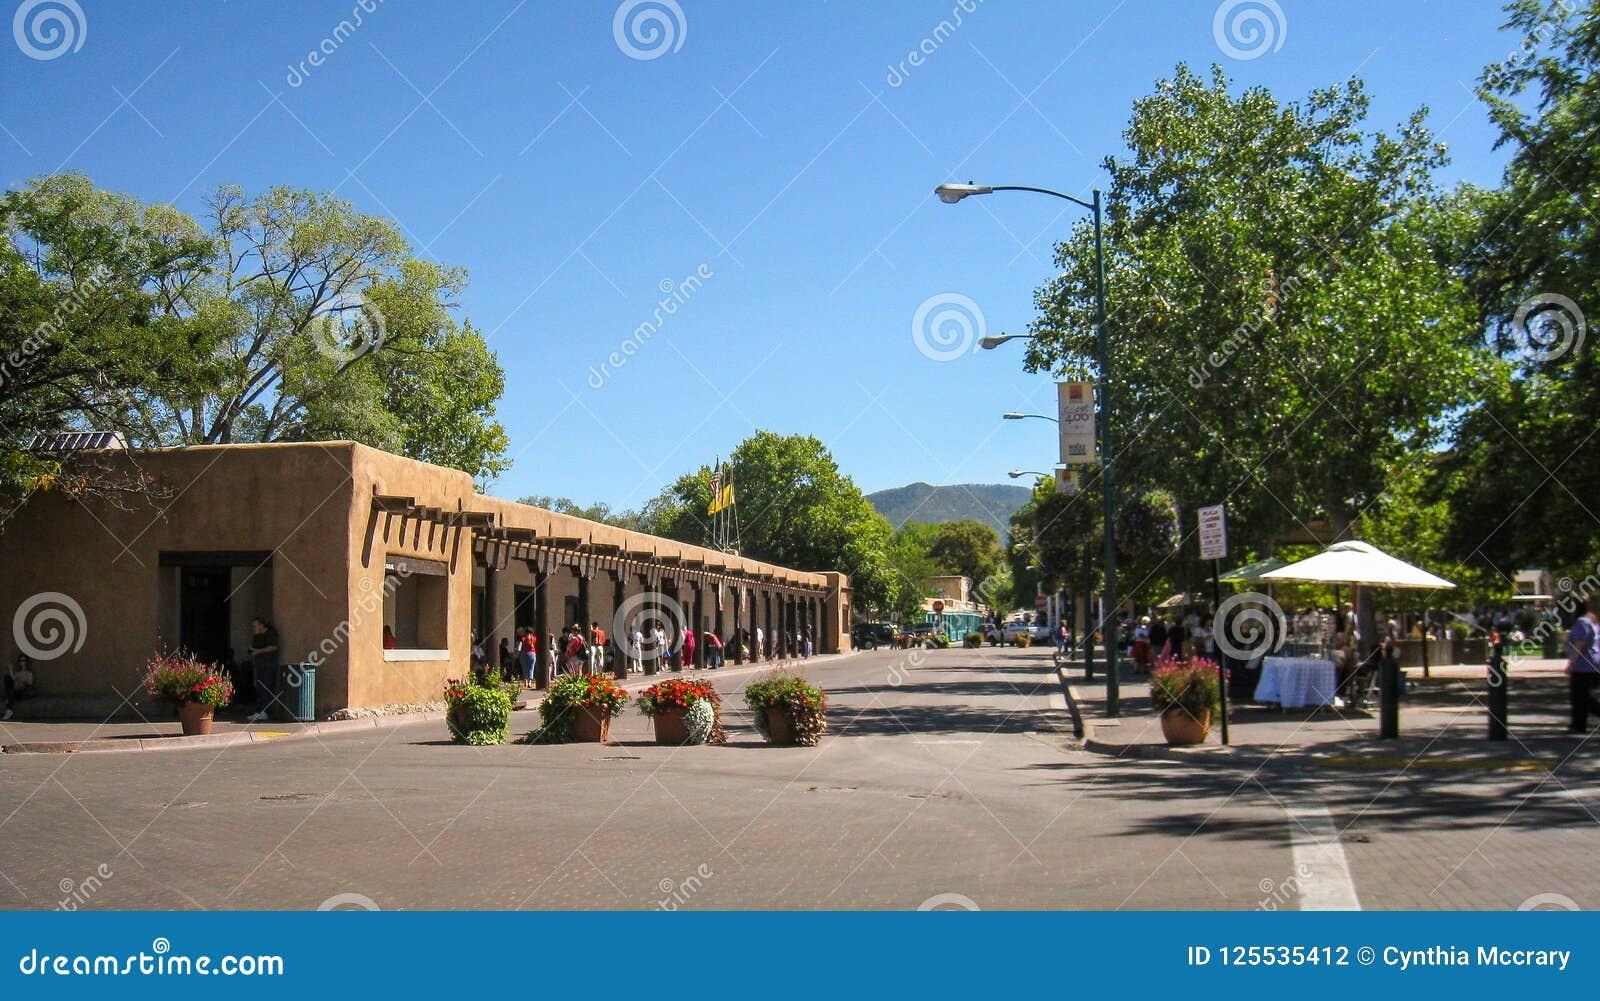 La plaza en Santa Fe, Nouveau Mexique